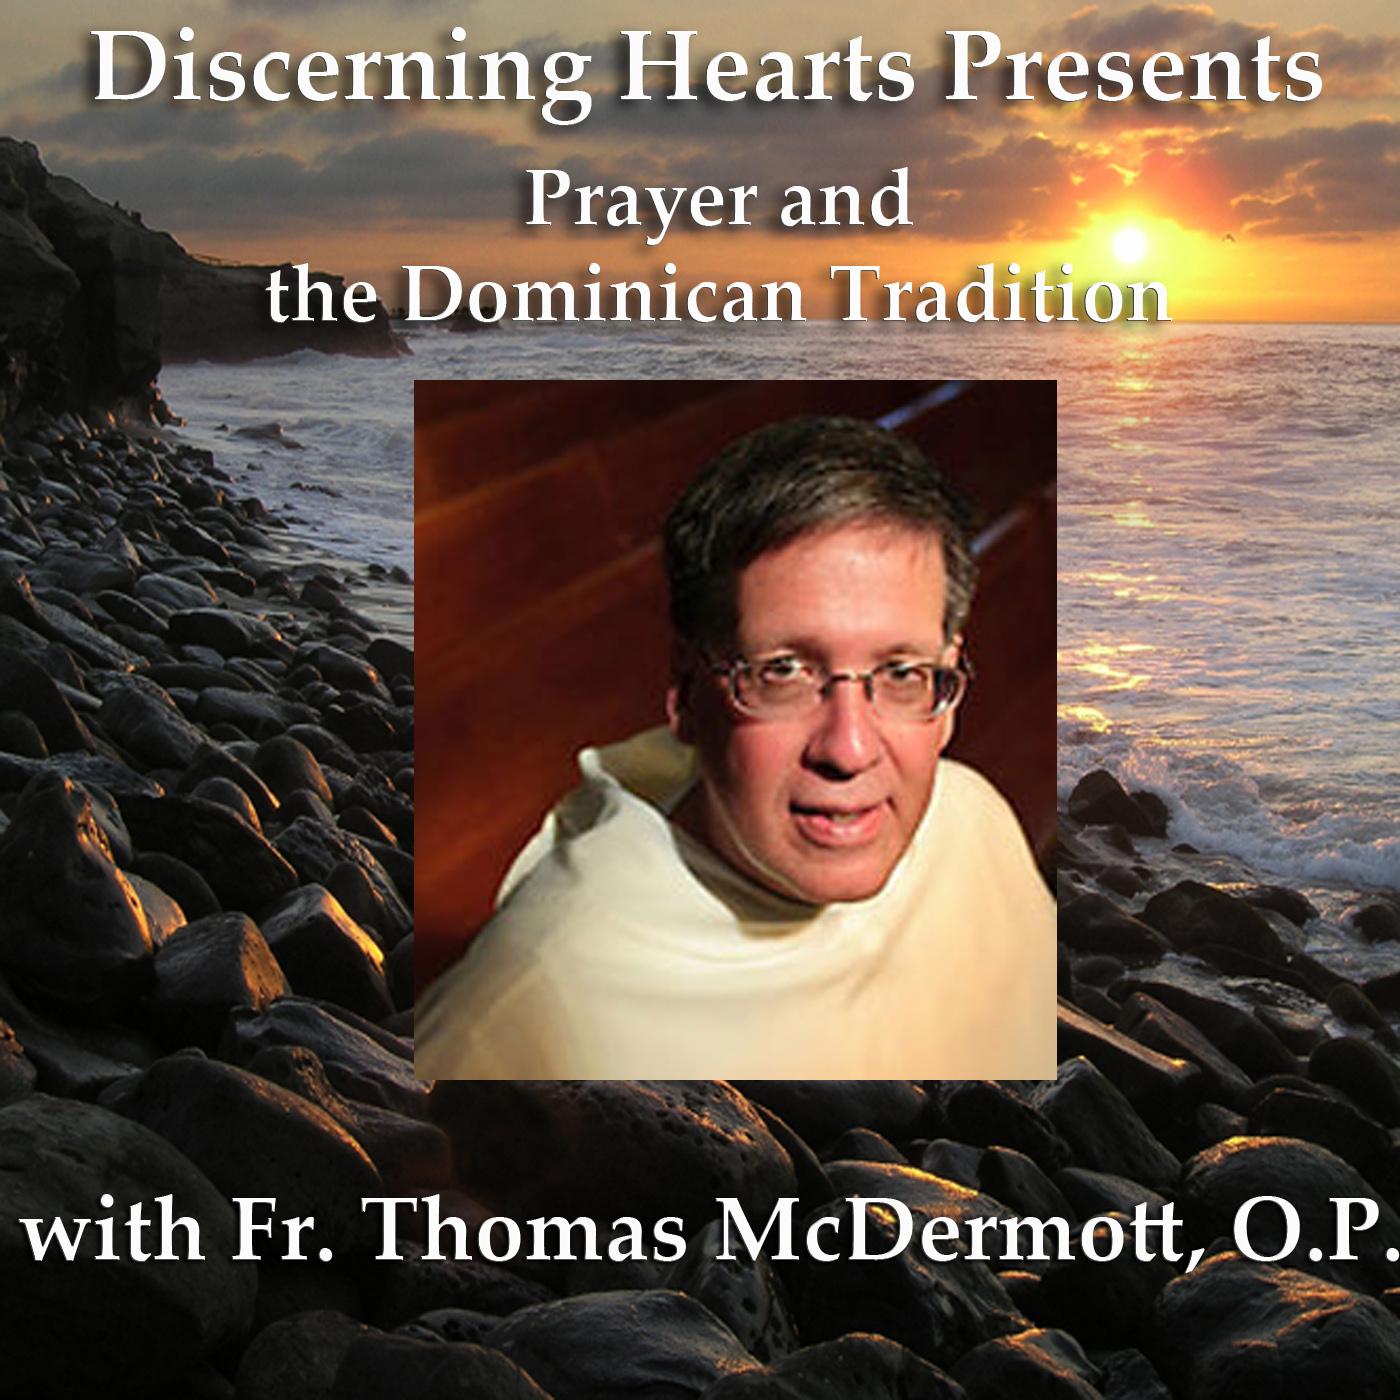 Discerning Hearts Catholic Podcasts » Fr. Thomas McDermott OP